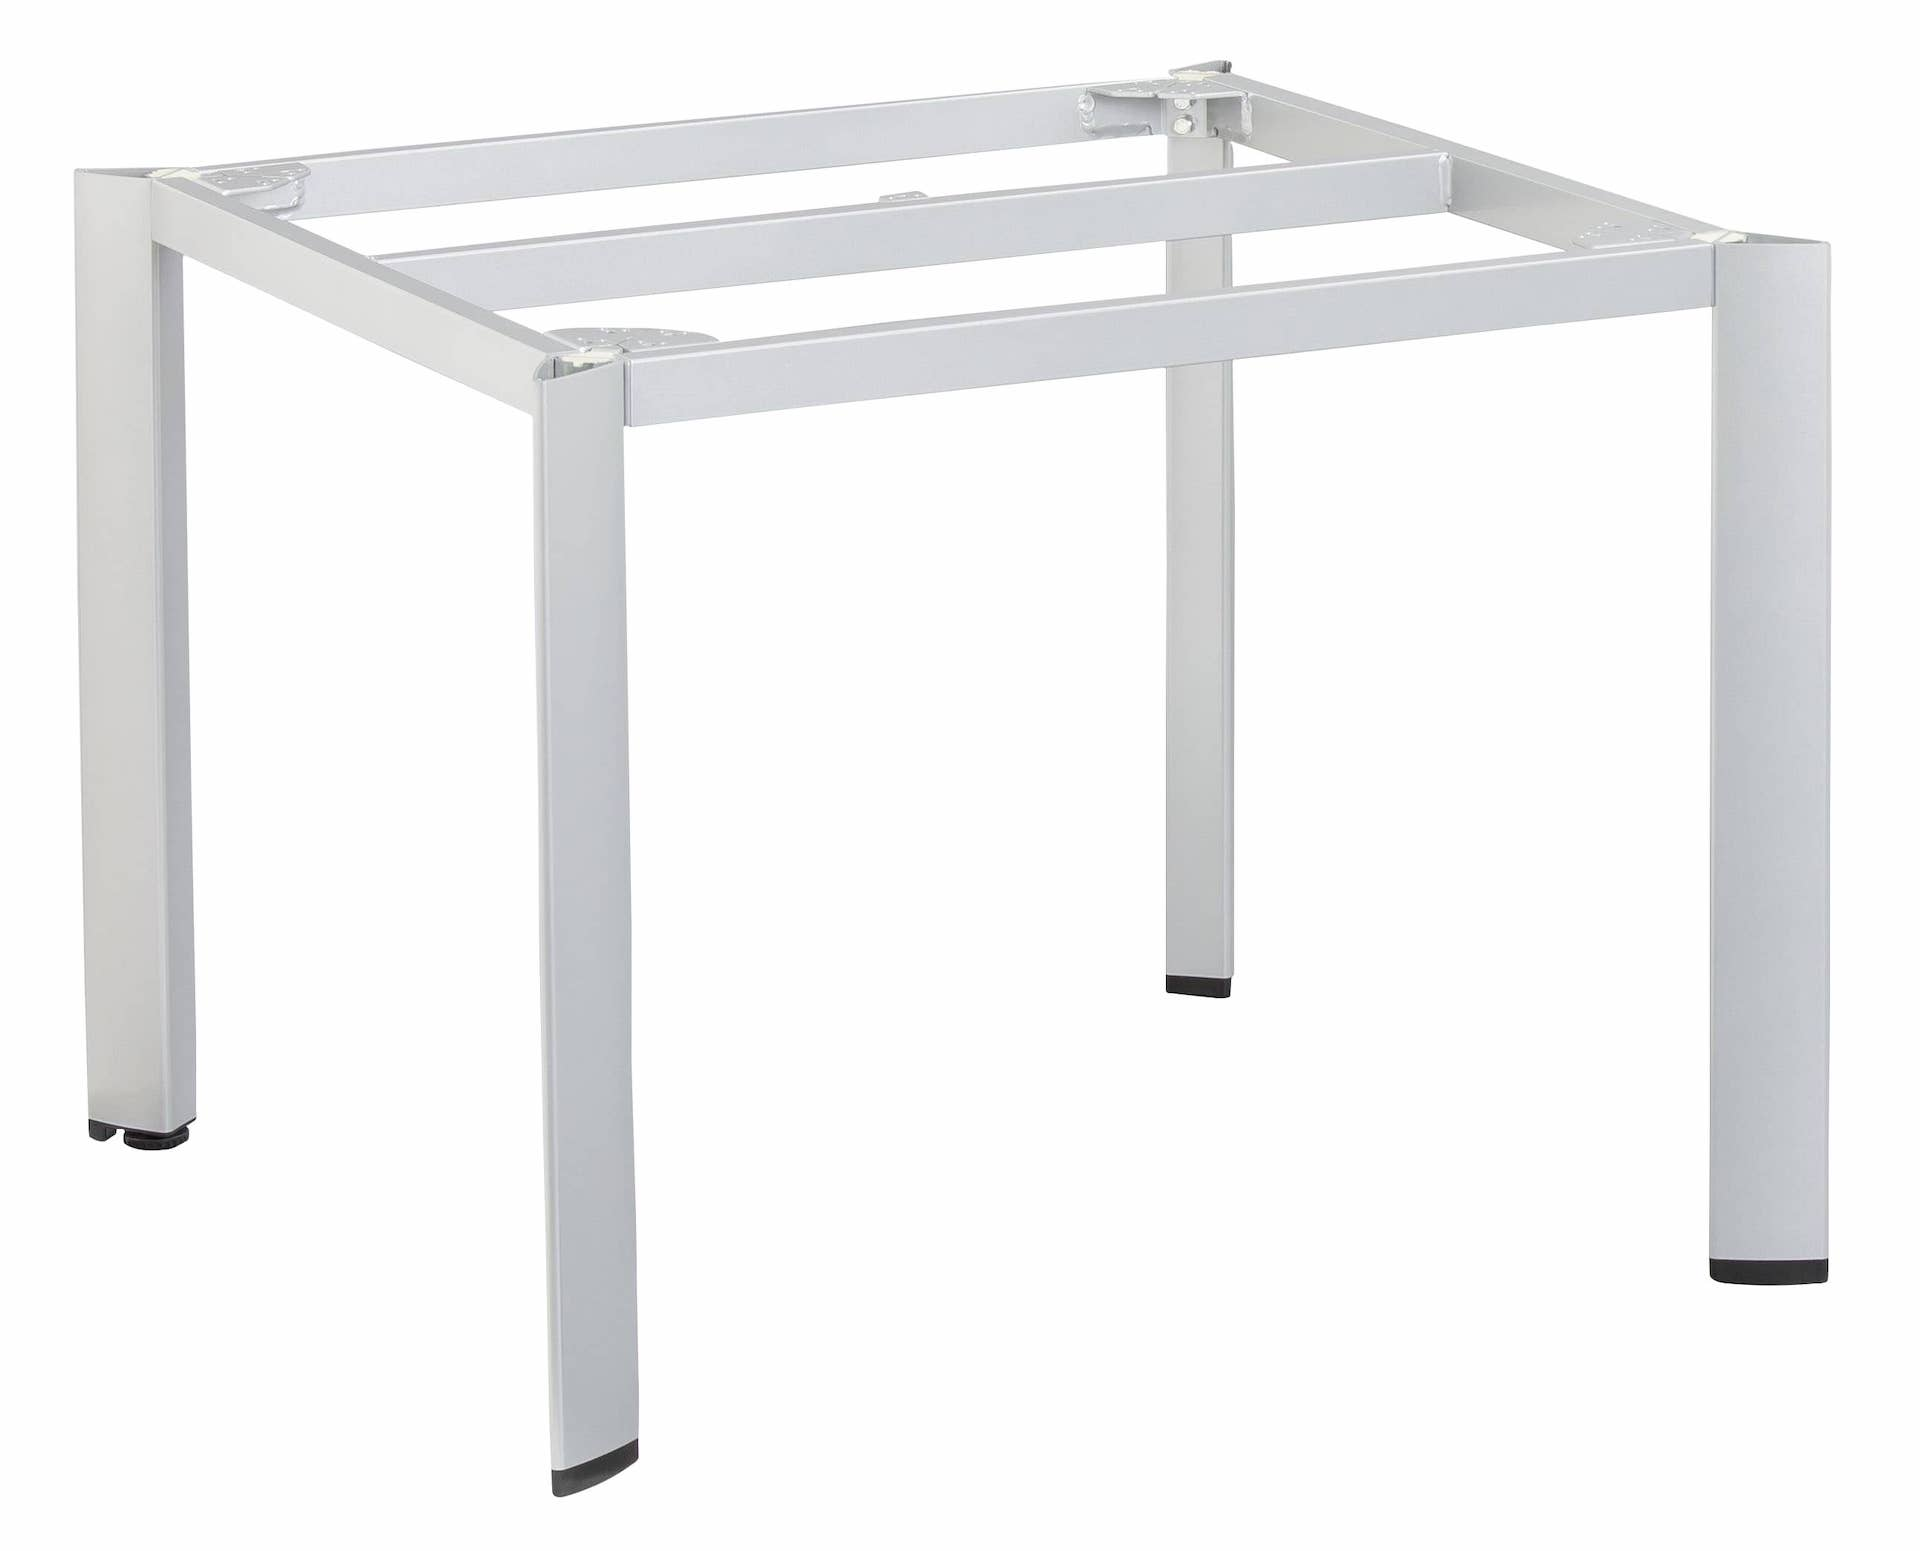 EDGE Tischgestell 95 x 95 cm